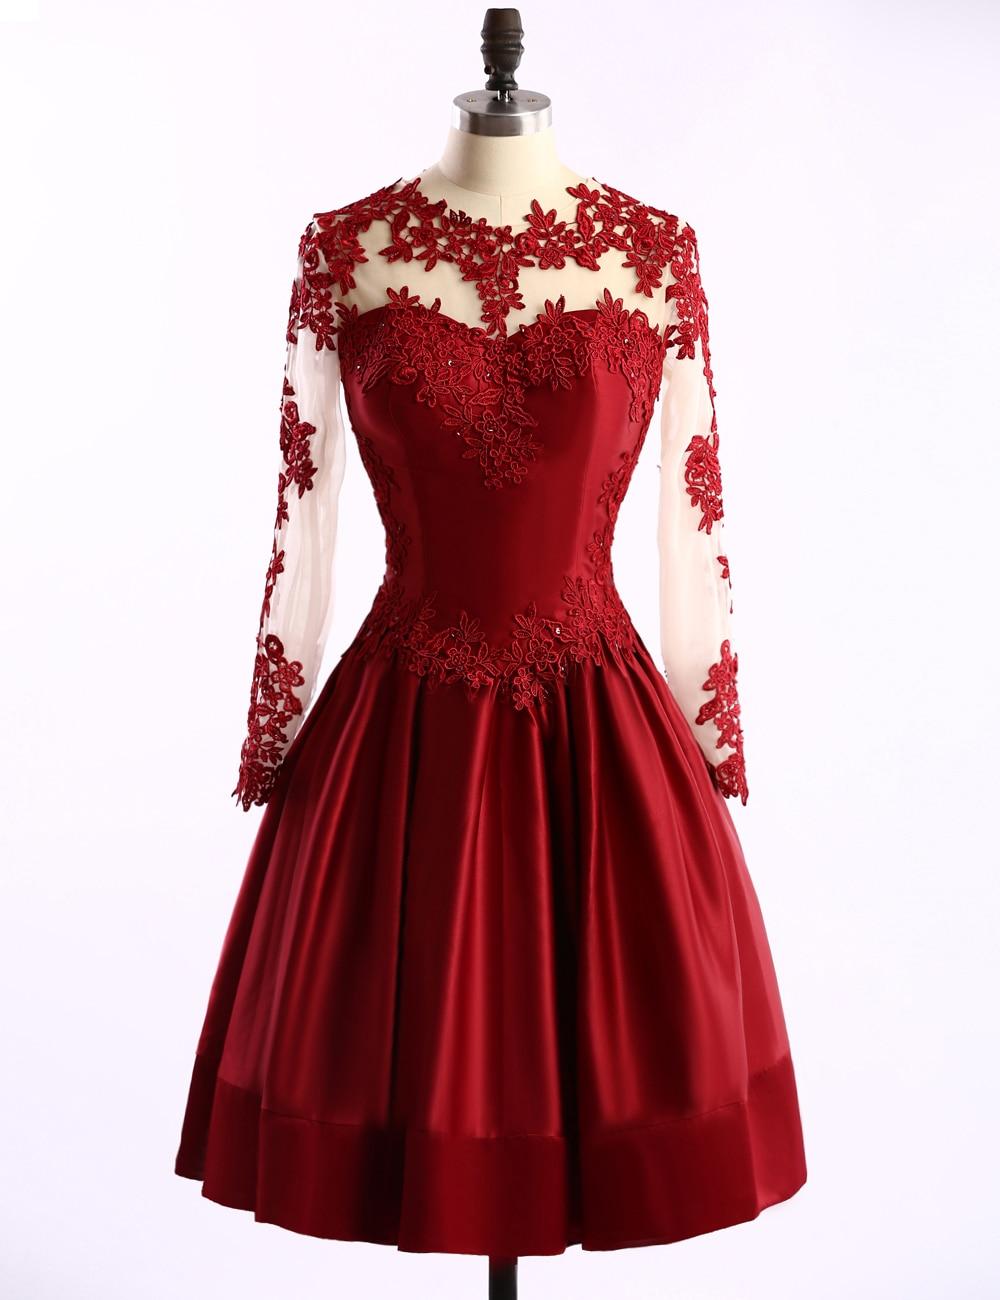 Aliexpress.com : Buy Burgundy Long Sleeve Prom Dresses 2016 Hot ...